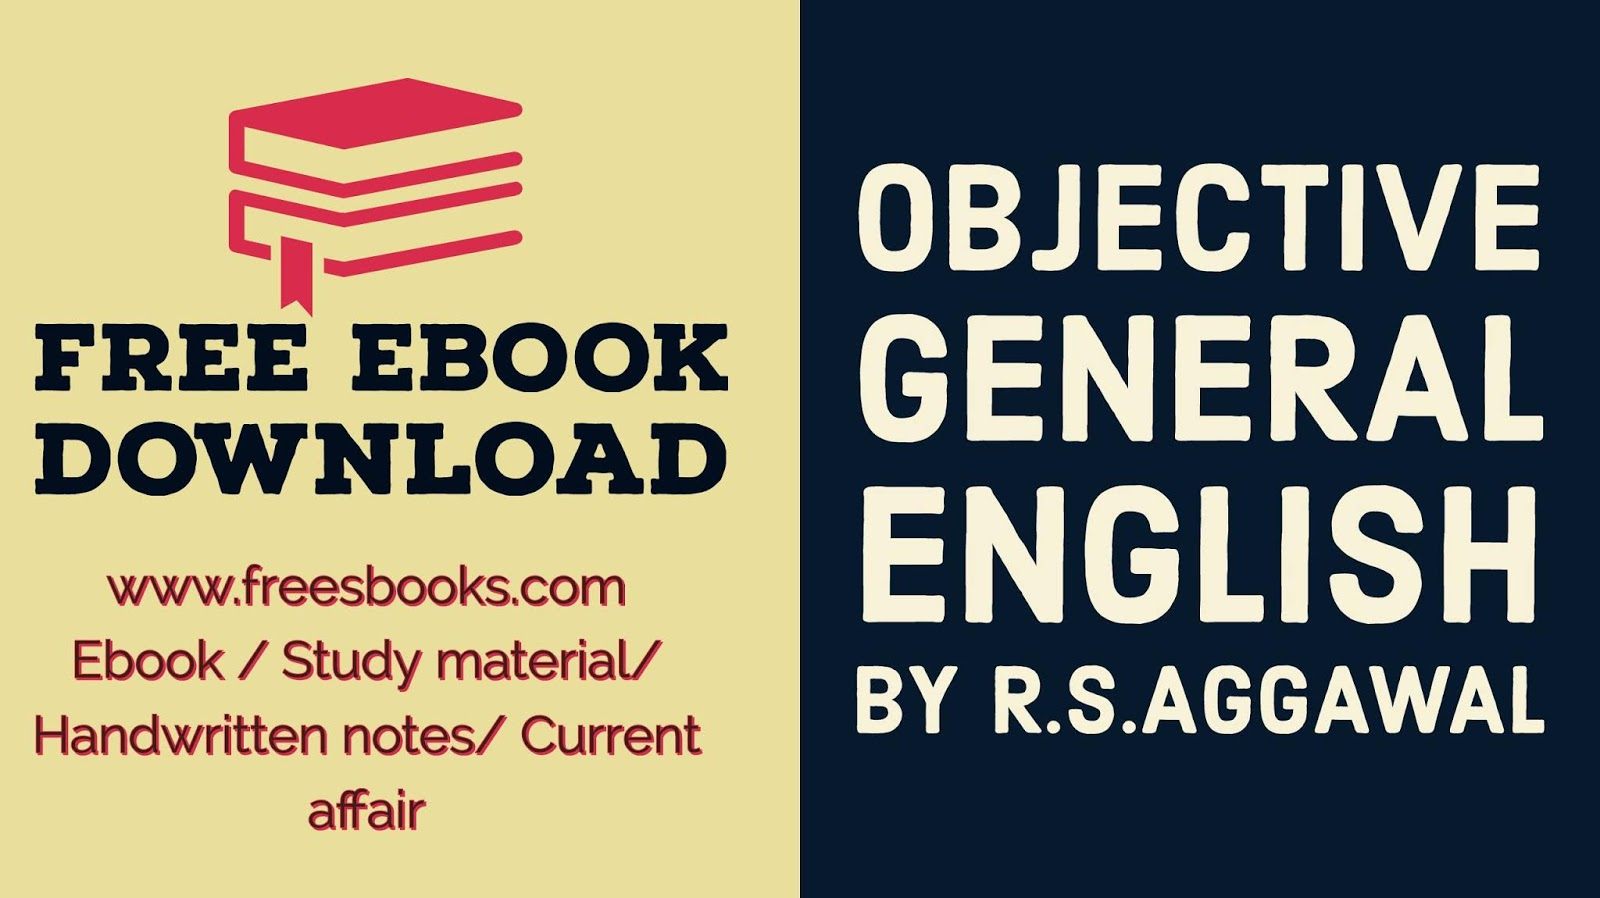 Free ebook download: ENGLISH